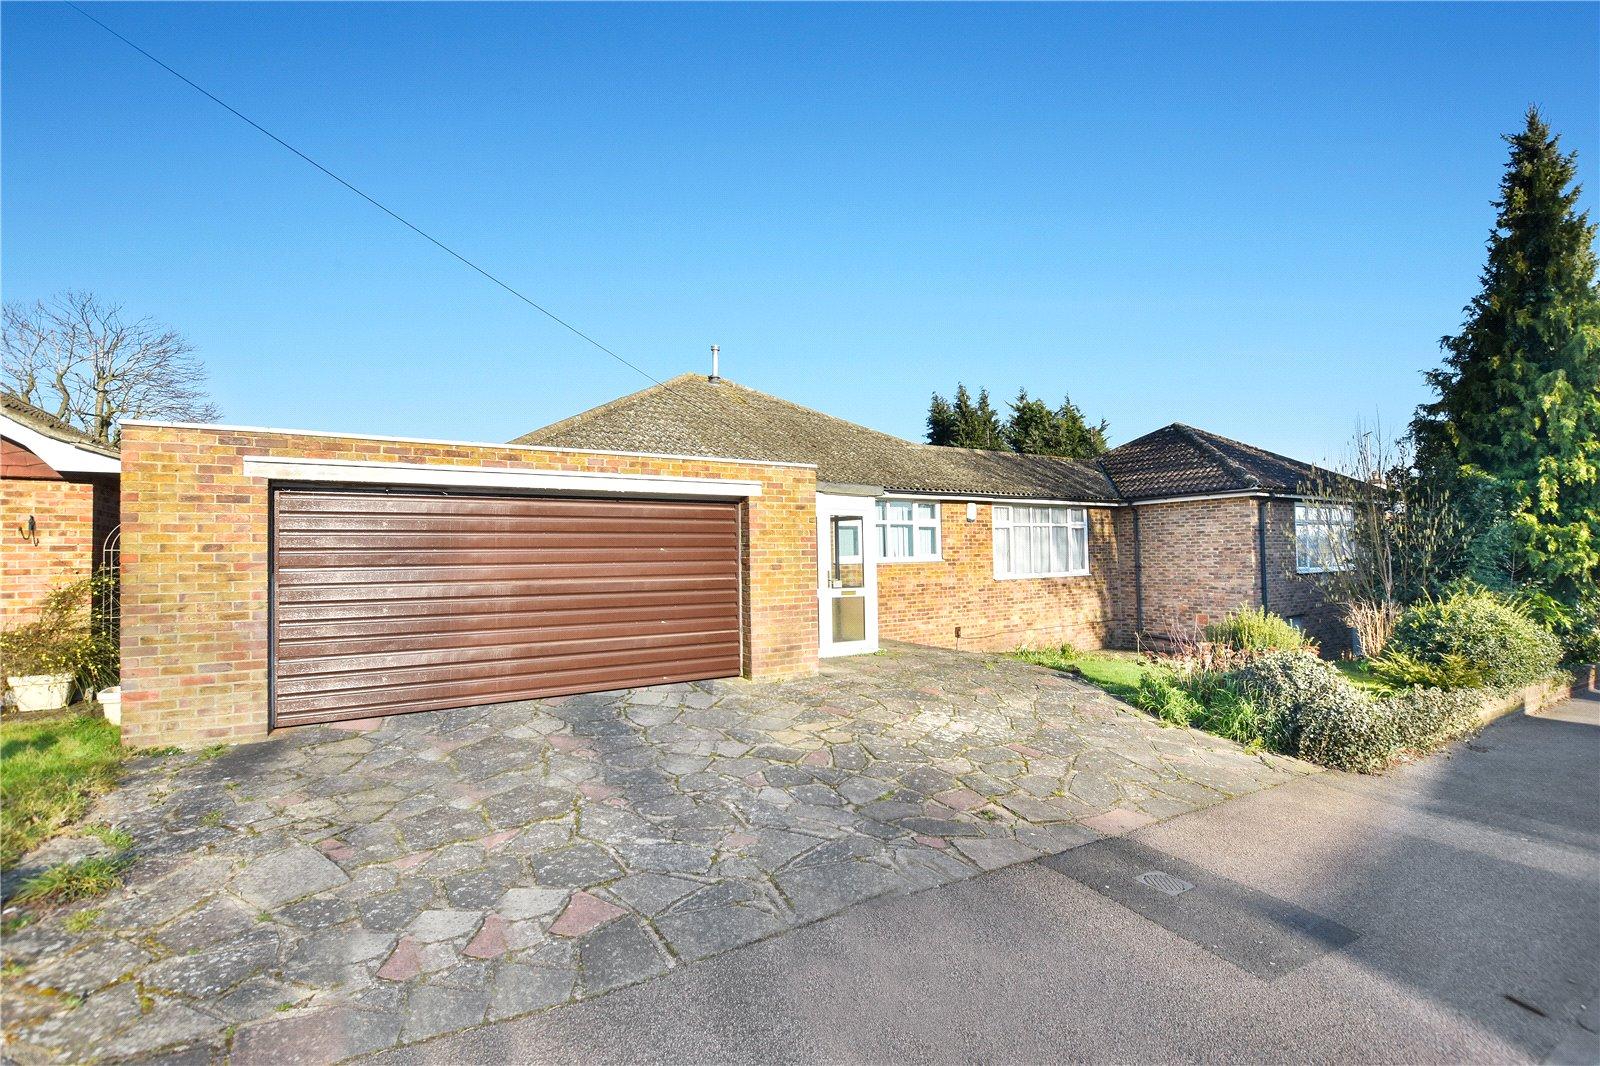 Summerhouse Drive, Joydens Wood, Kent, DA2